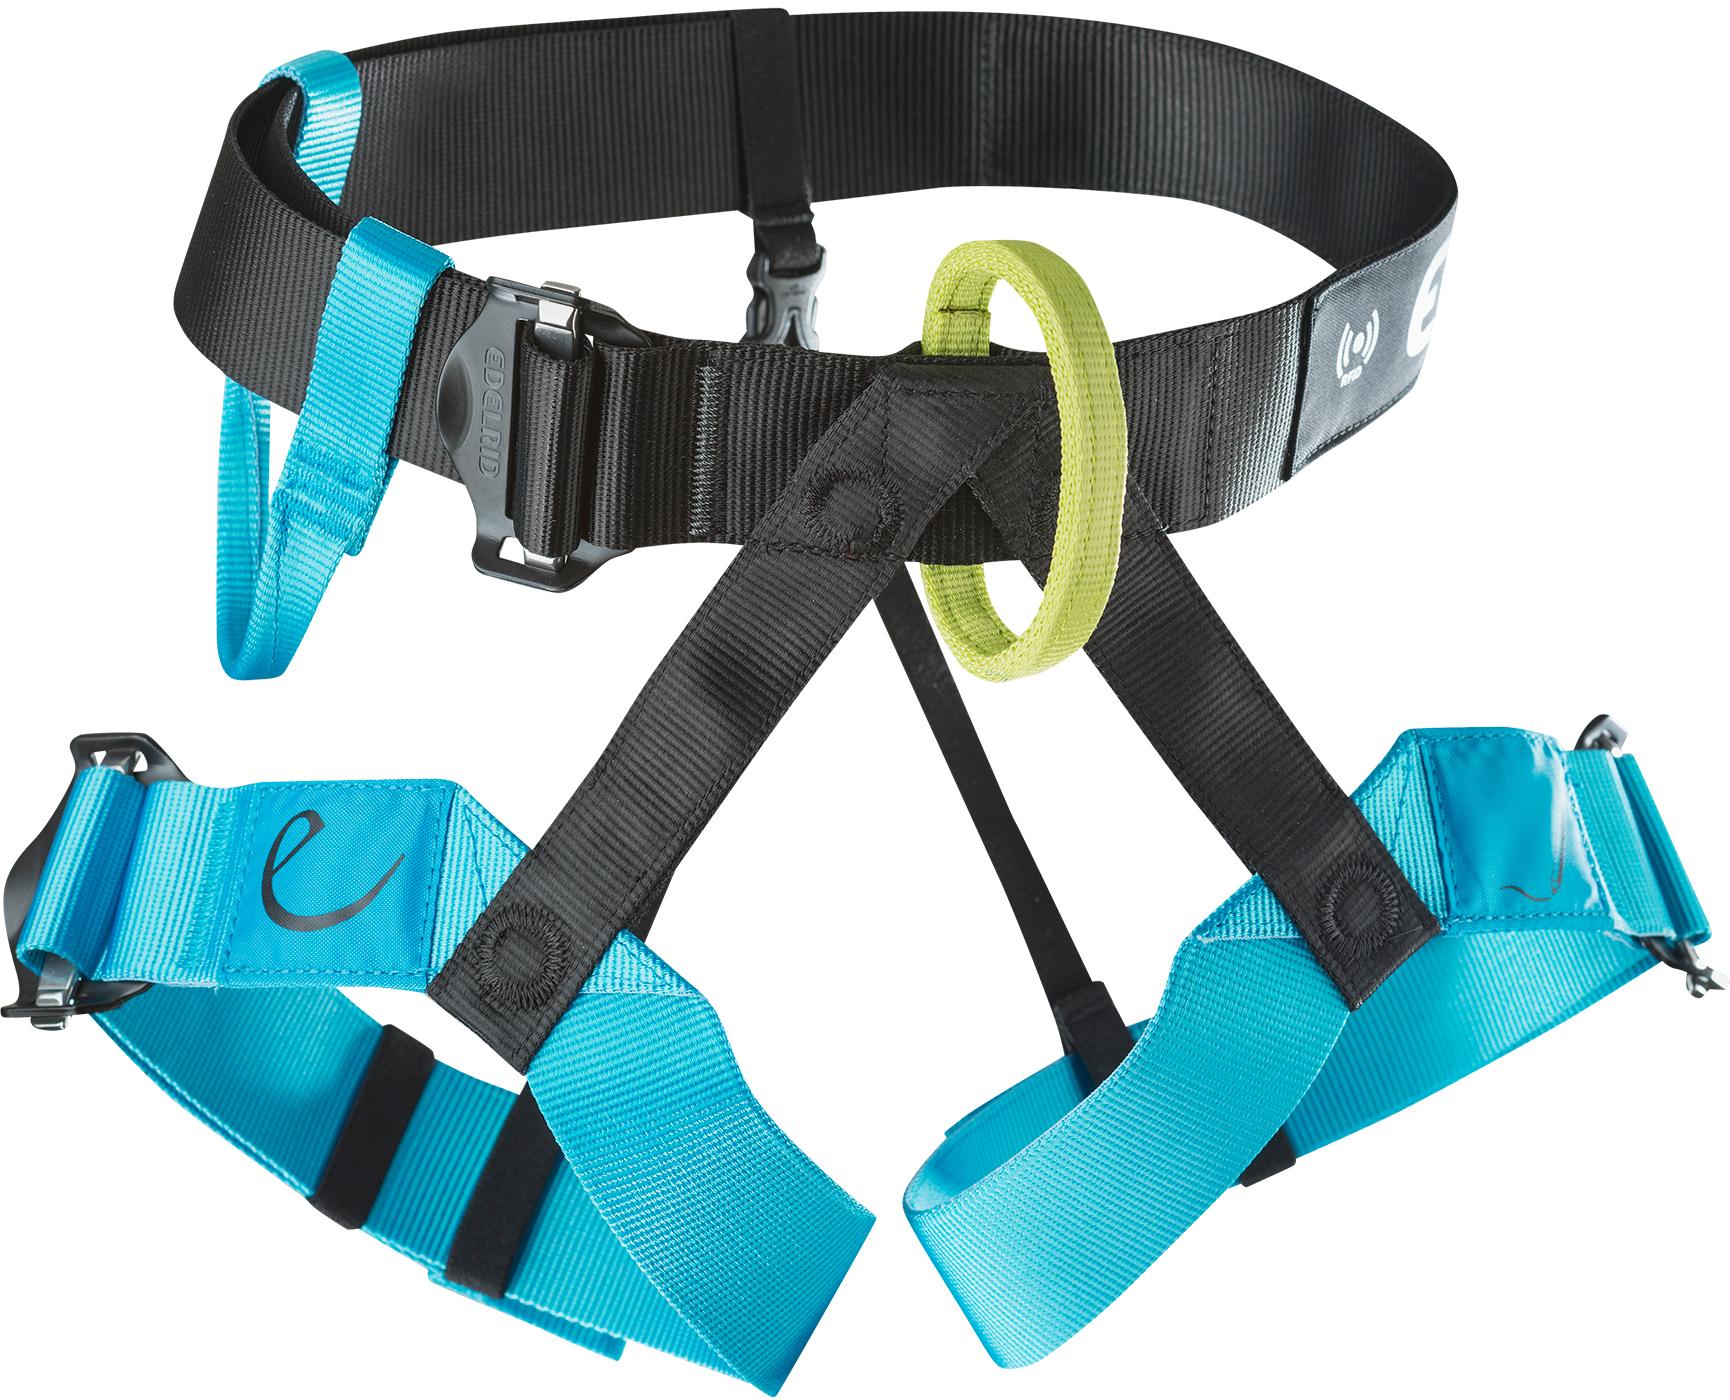 Edelrid Klettergurt Jay Test : Edelrid climbing harnesses